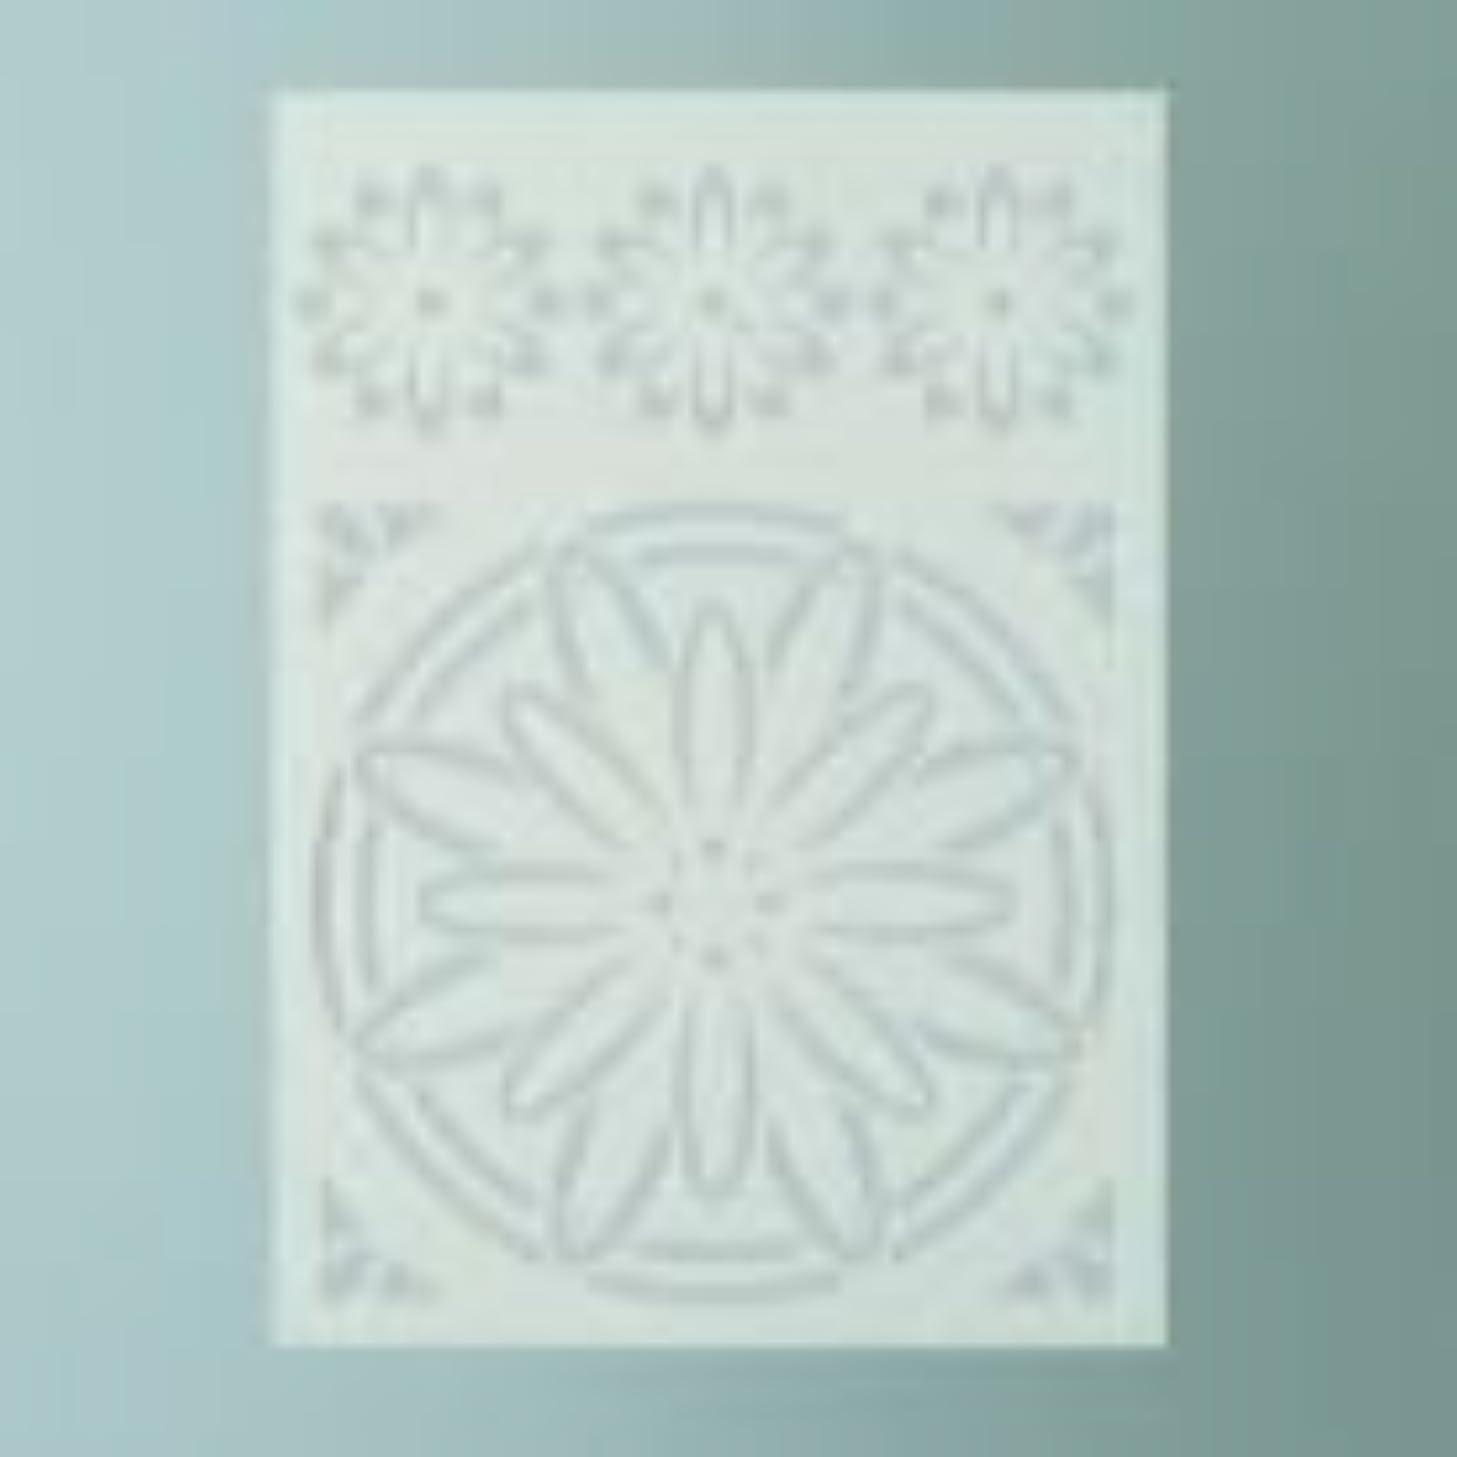 Efco Blossom Stencil in 2 Designs, Plastic, Transparent, A5